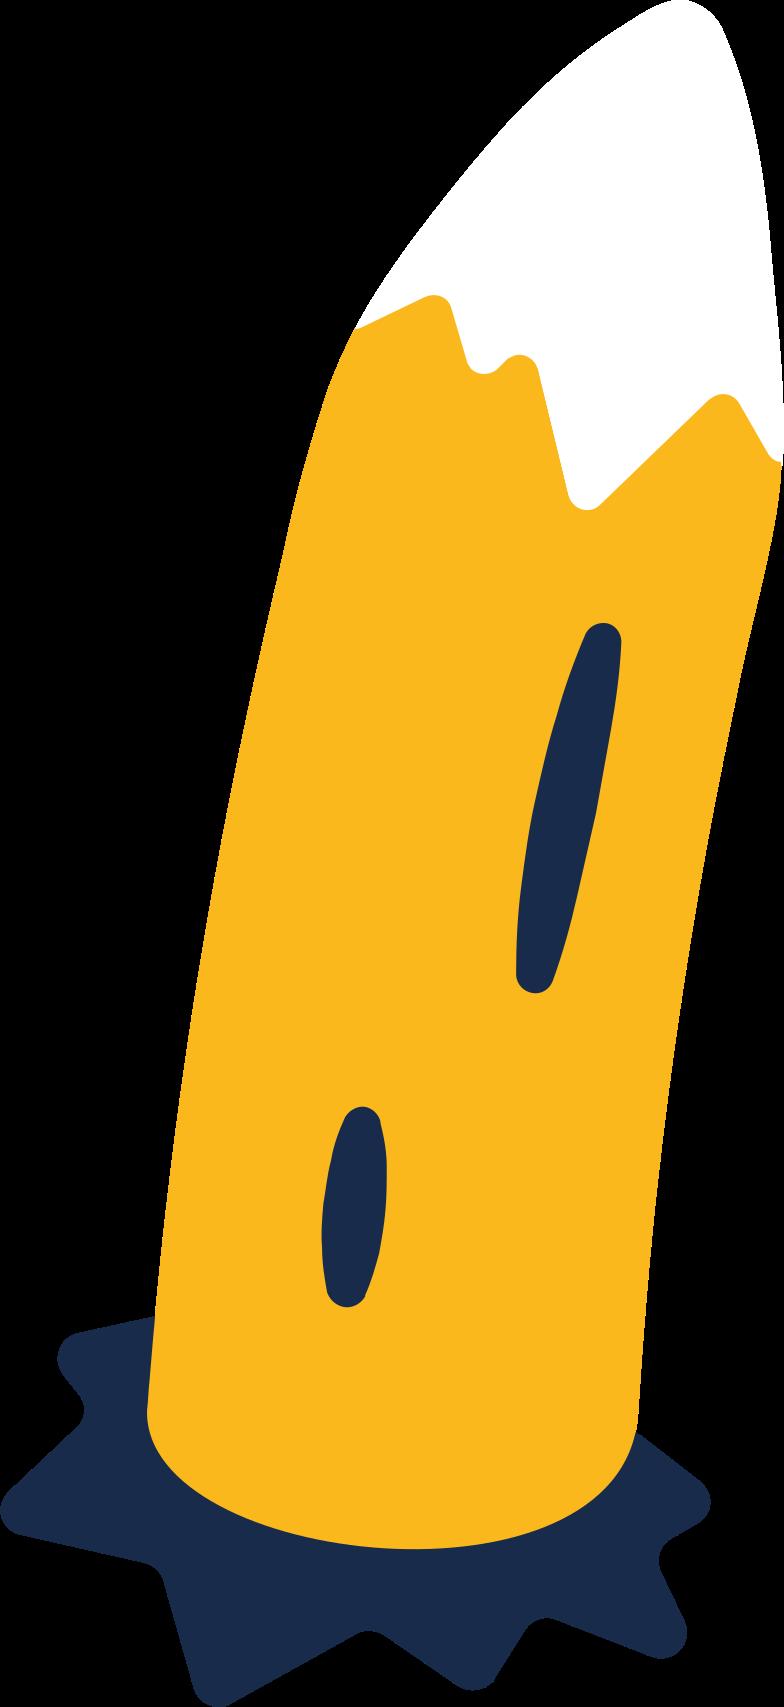 bough Clipart illustration in PNG, SVG